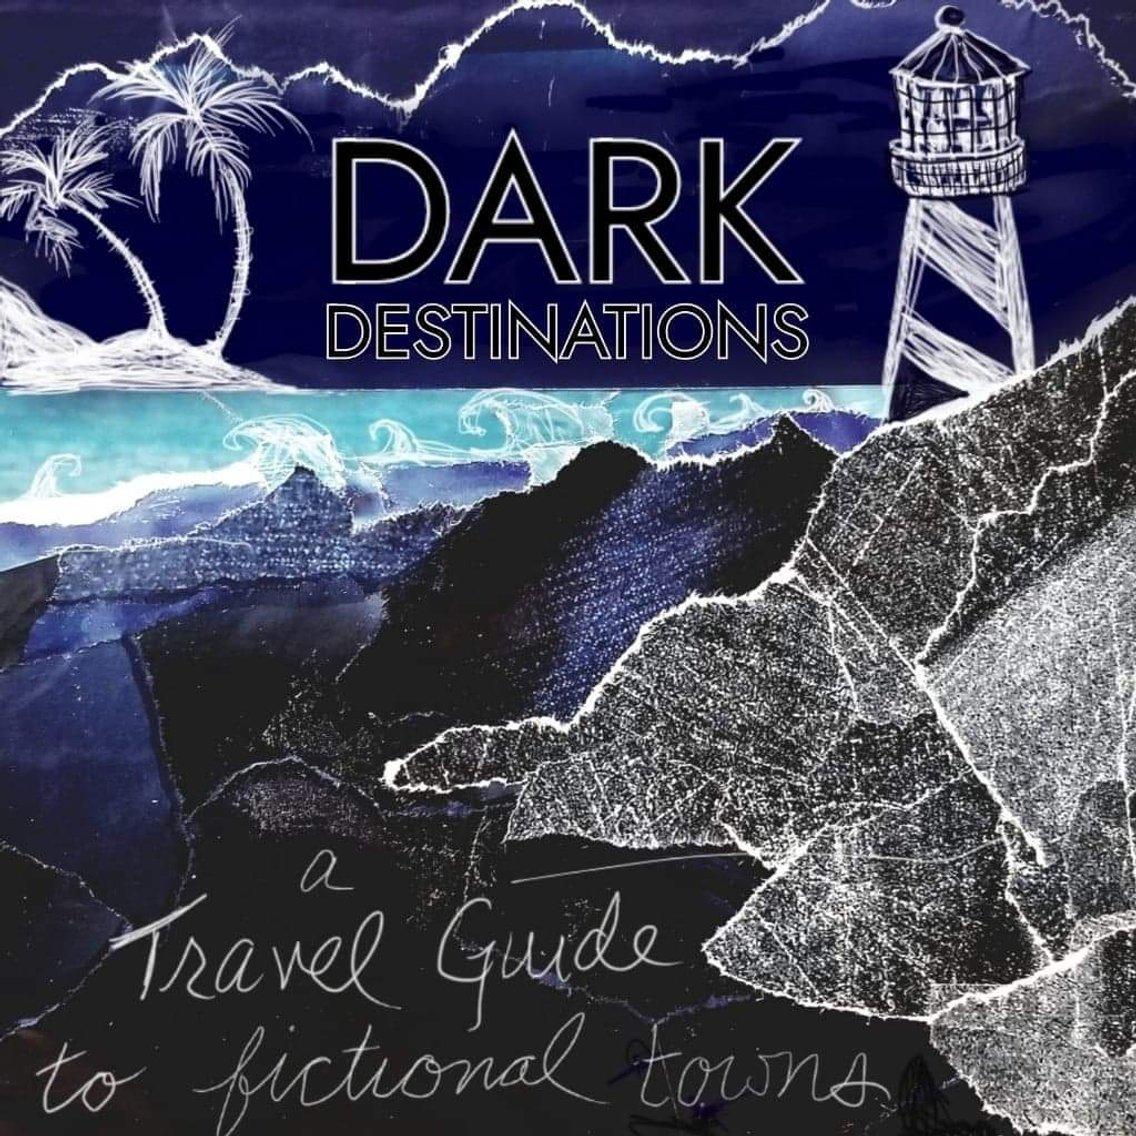 Dark Destinations - Cover Image